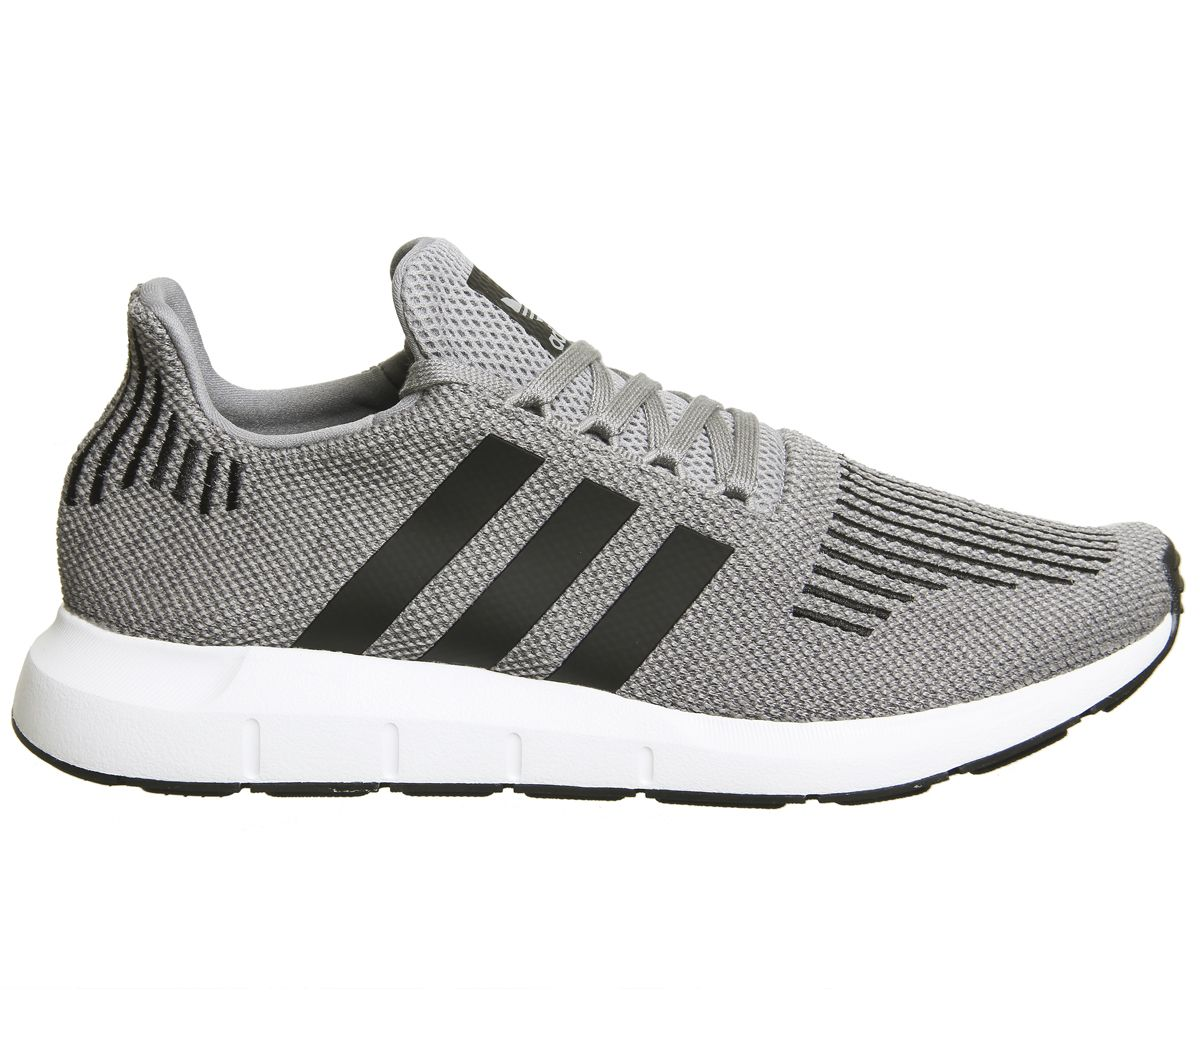 1df0fd57e adidas Swift Run Trainers Grey Core Black - Unisex Sports